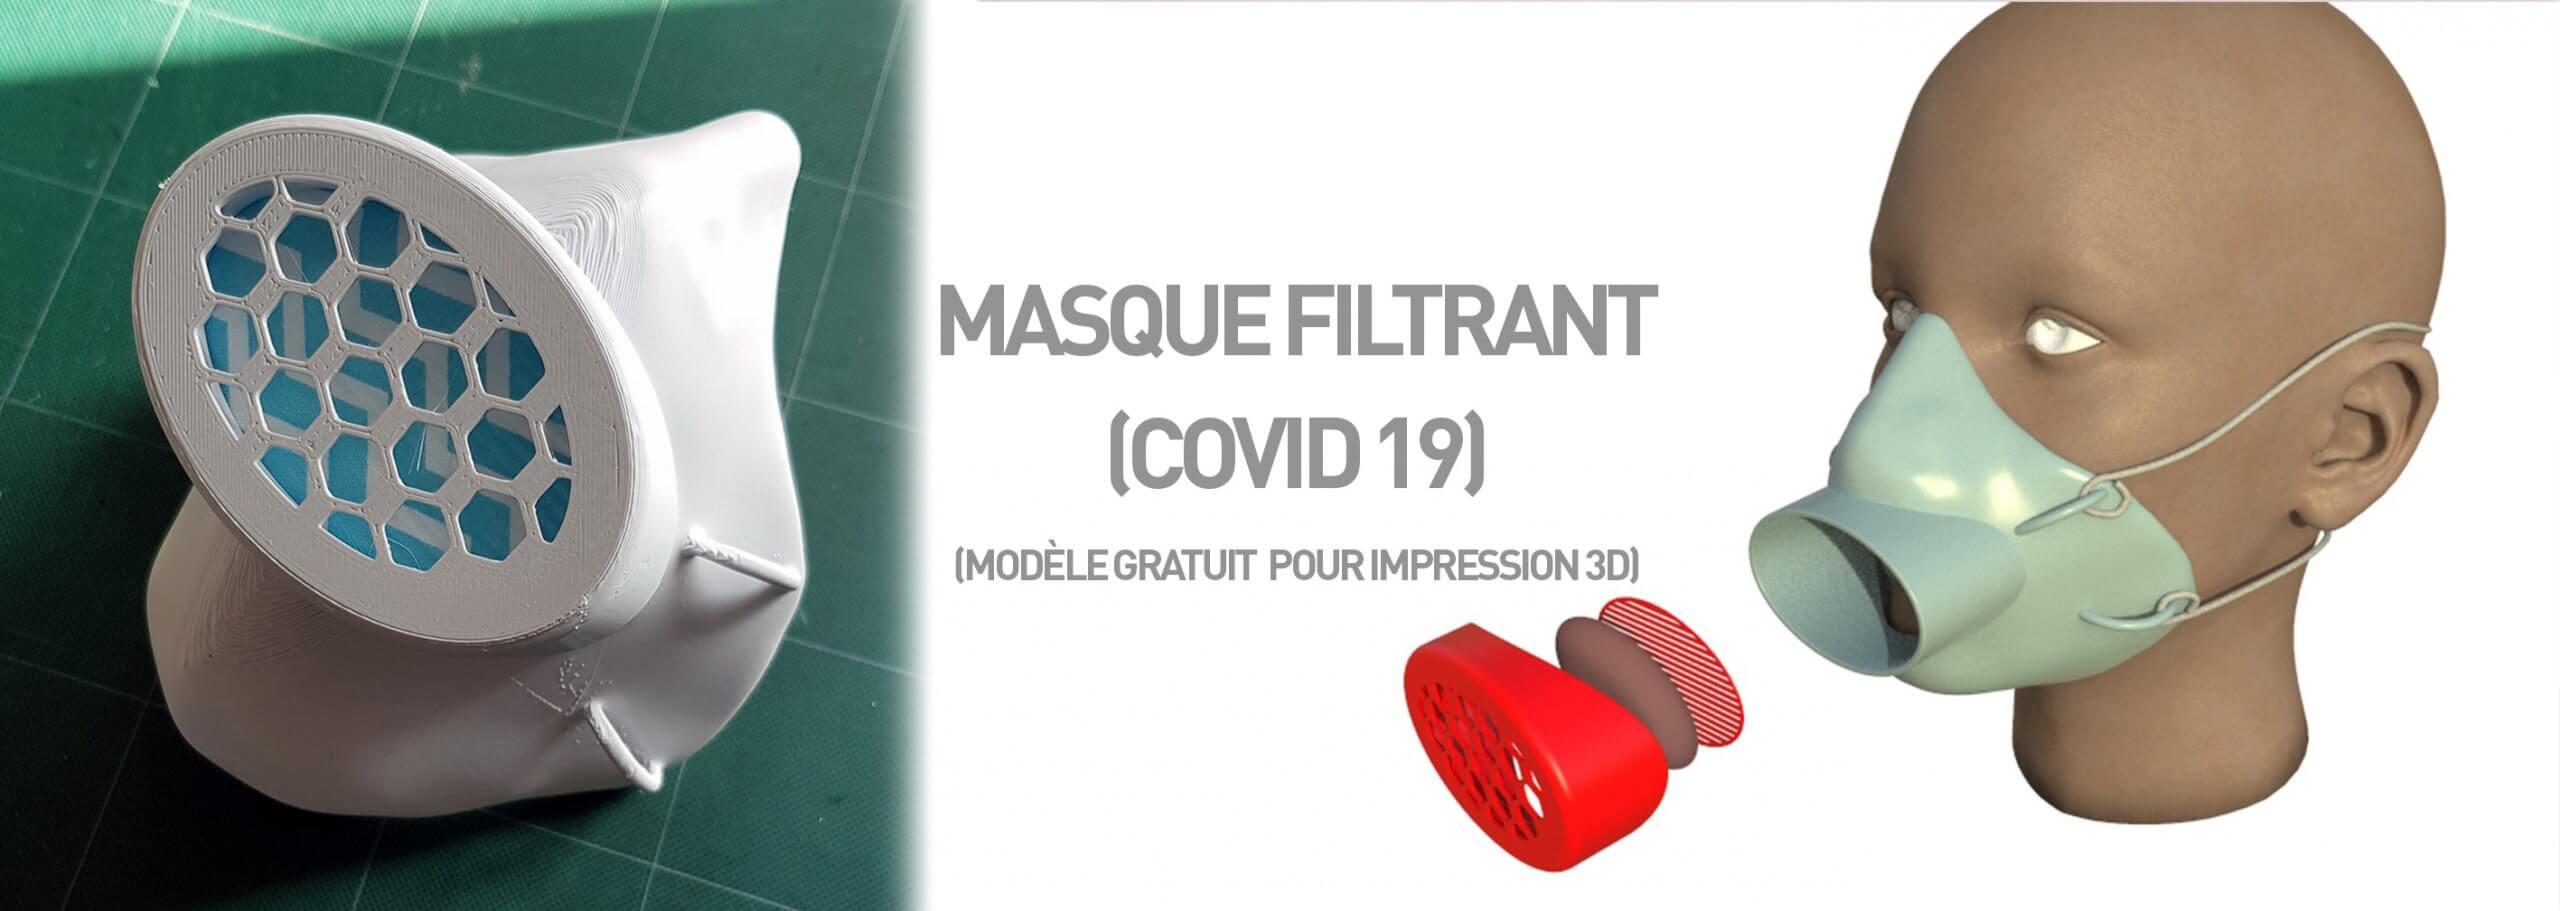 bannière masque filtrant covid 19